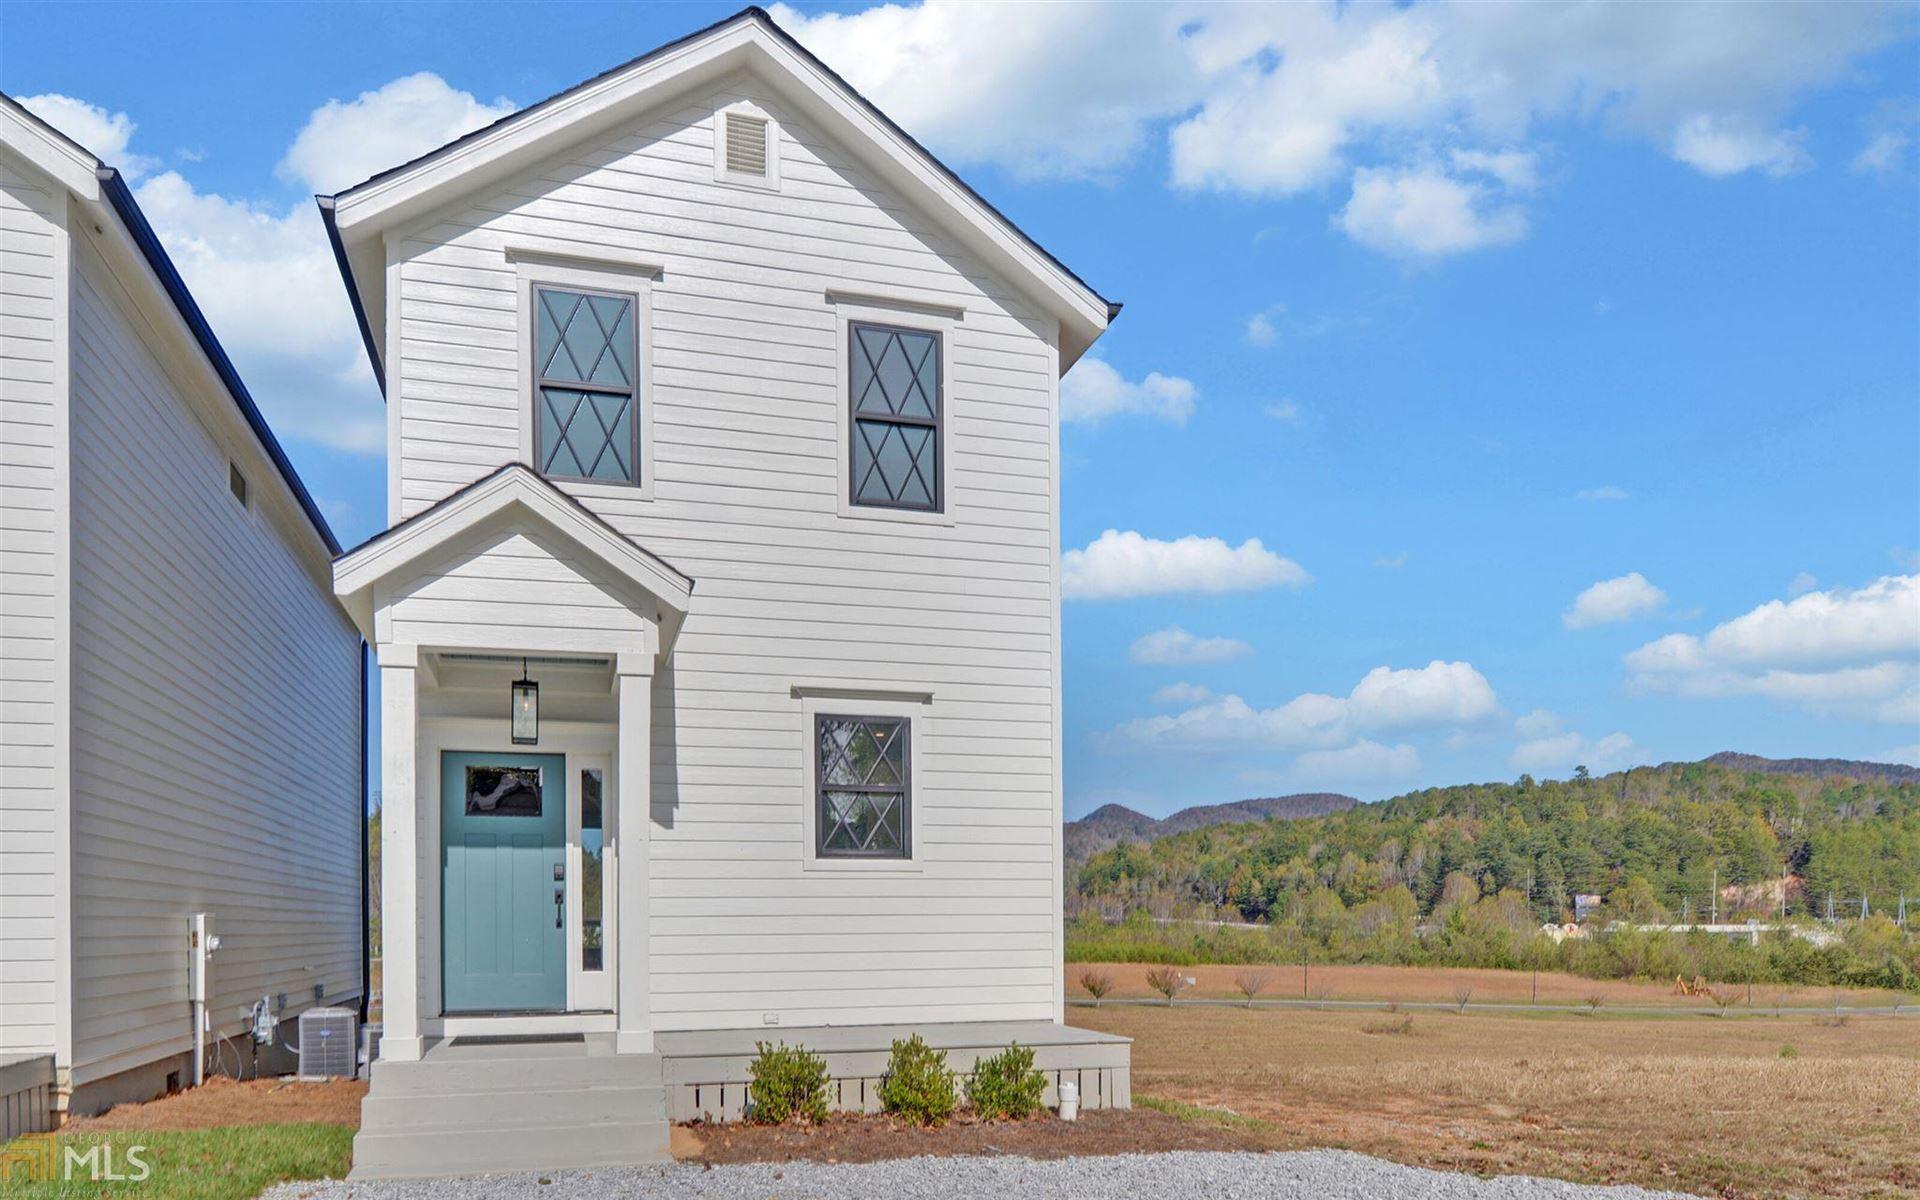 39 Cottonwood St, Clayton, GA 30525 - MLS#: 8886619